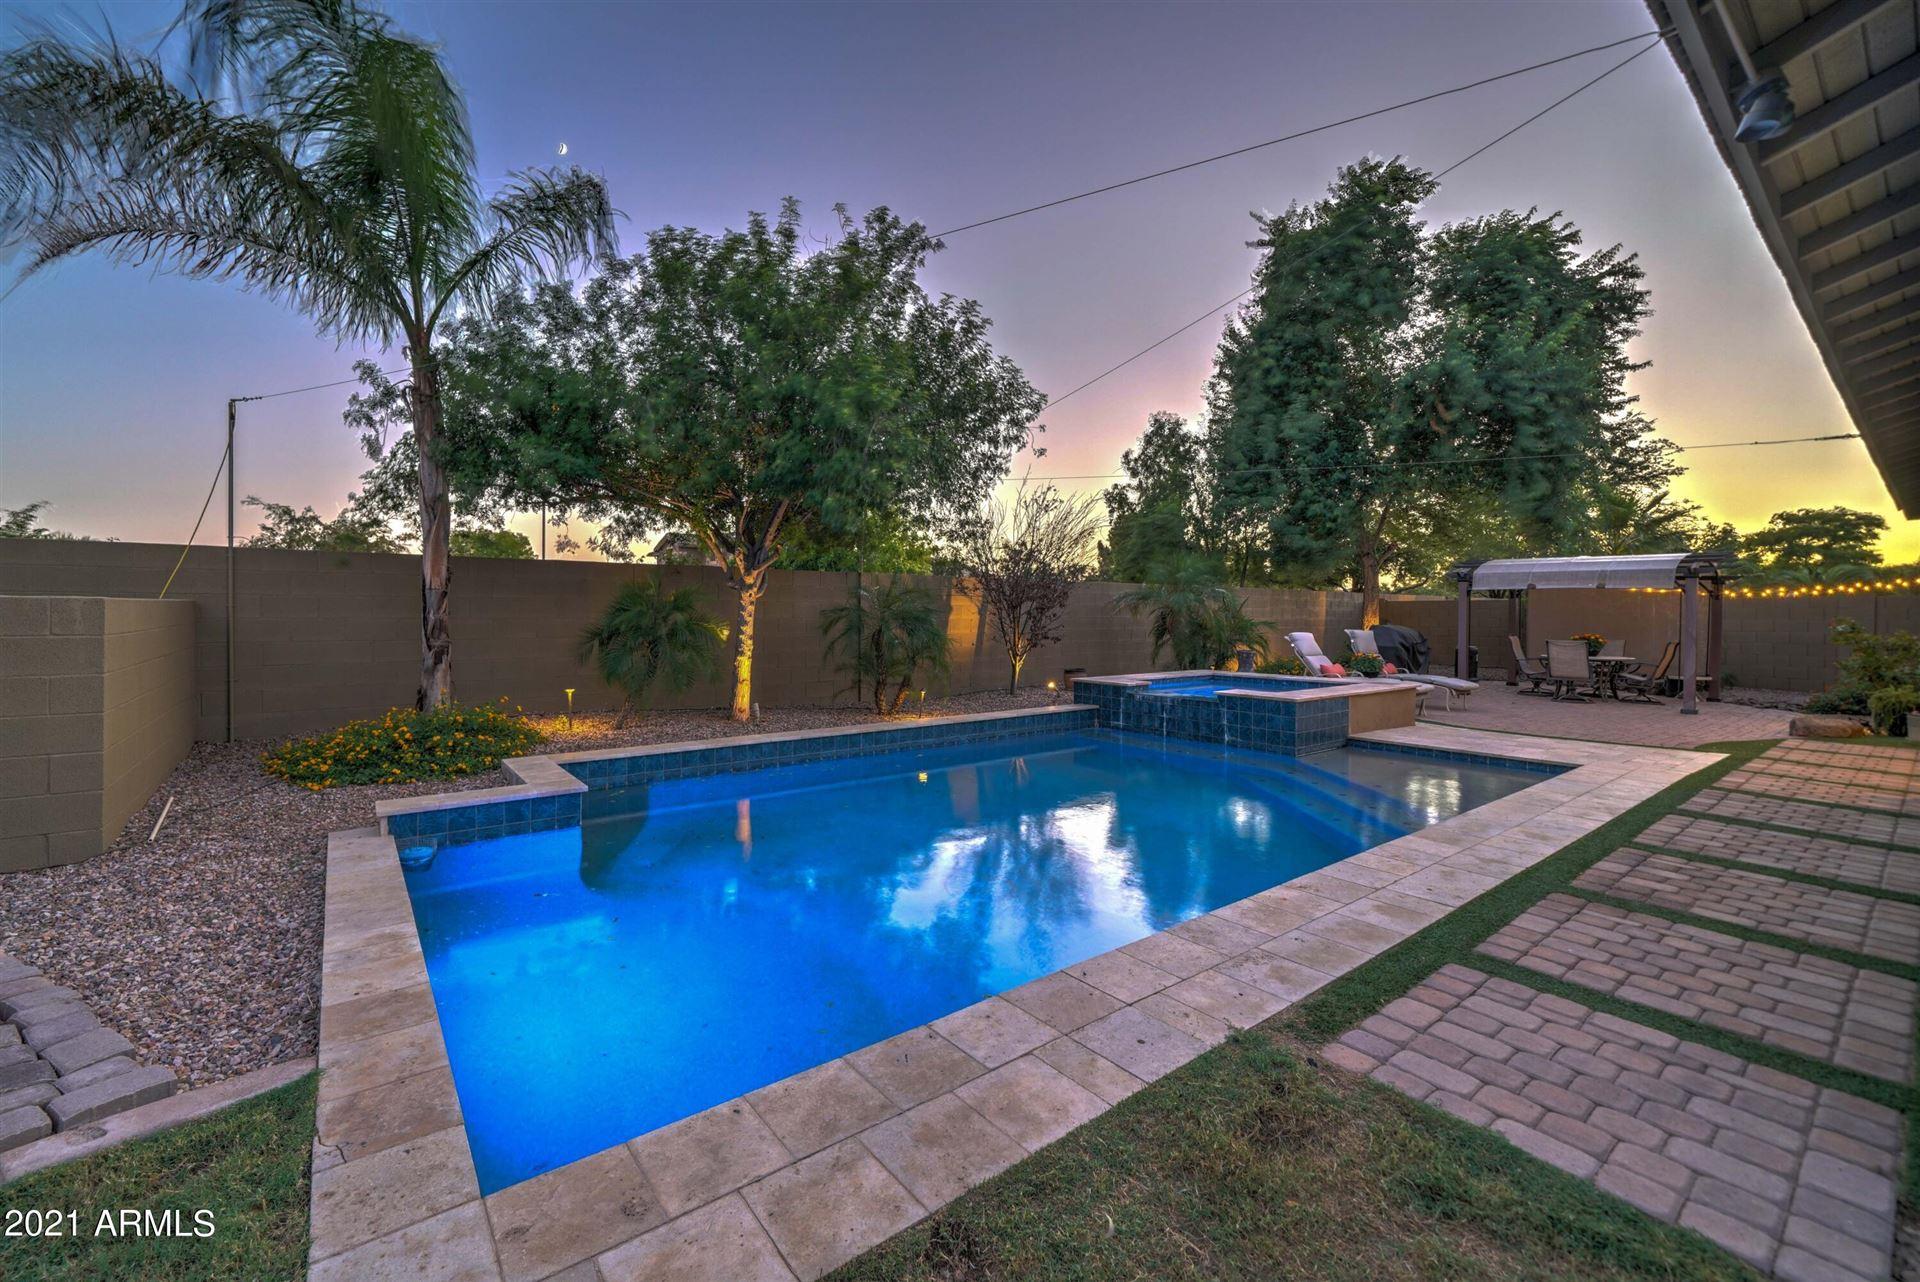 Photo of 3961 E BIRCHWOOD Place, Chandler, AZ 85249 (MLS # 6306276)